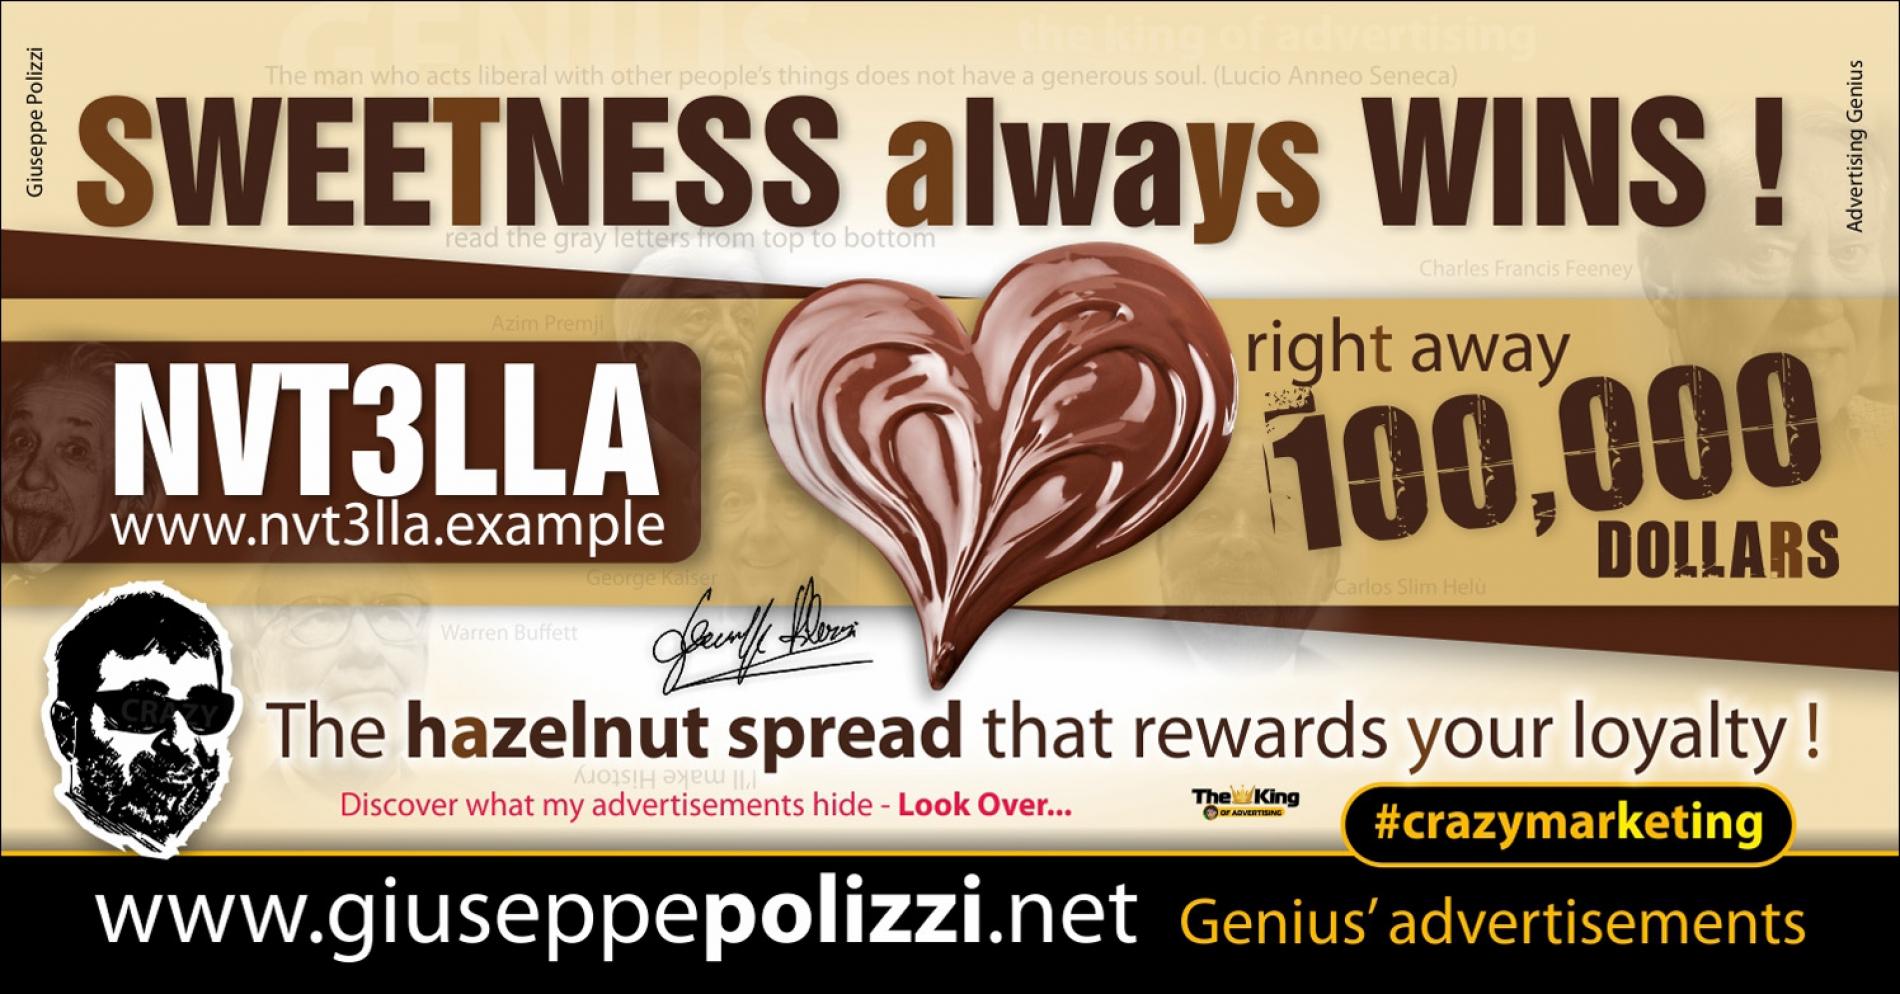 giuseppe polizzi advertisement SWEETNESS always WINS  crazy marketing genius  2017